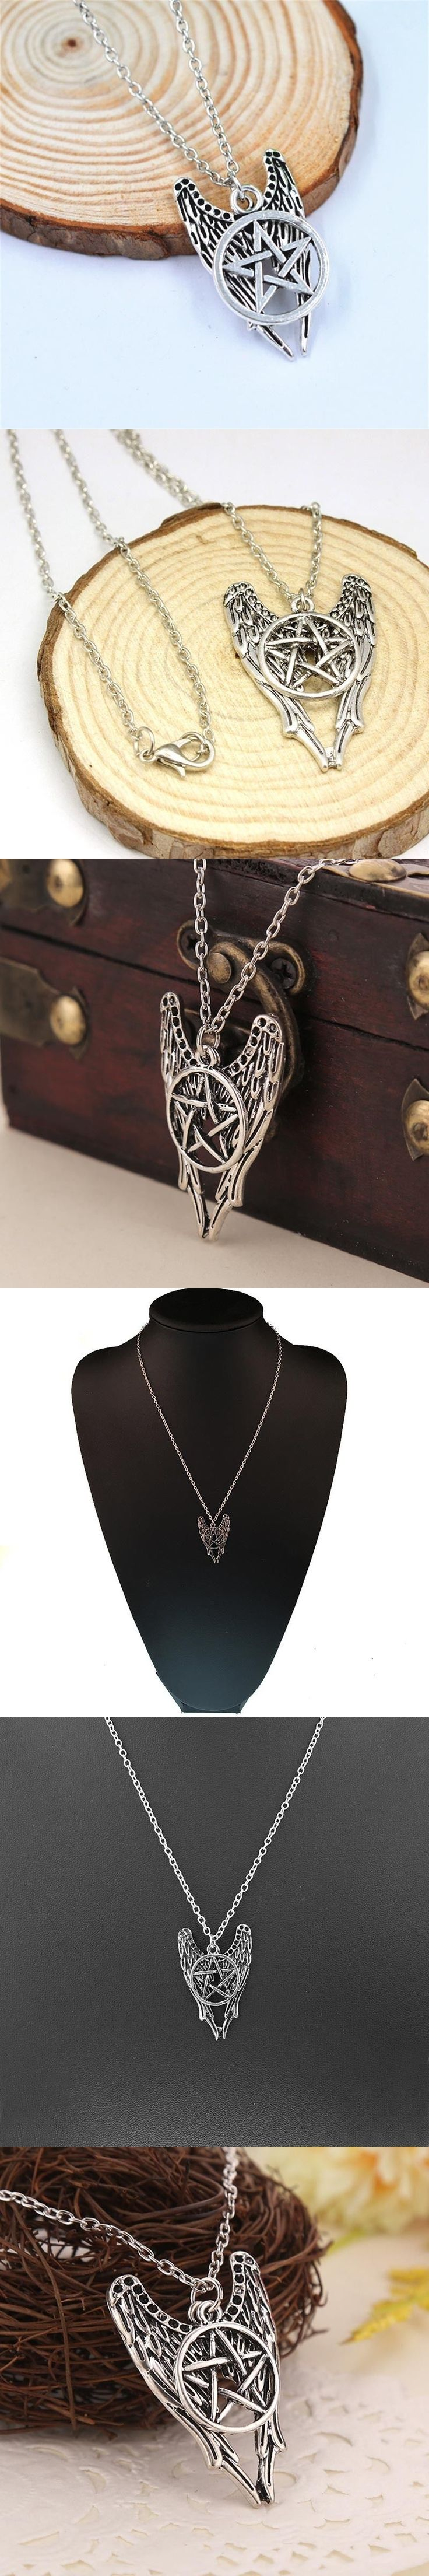 Engel Pentagramm Amulett Winchester Inspire Supernatural-Anhanger-Halskette Styling Accessory